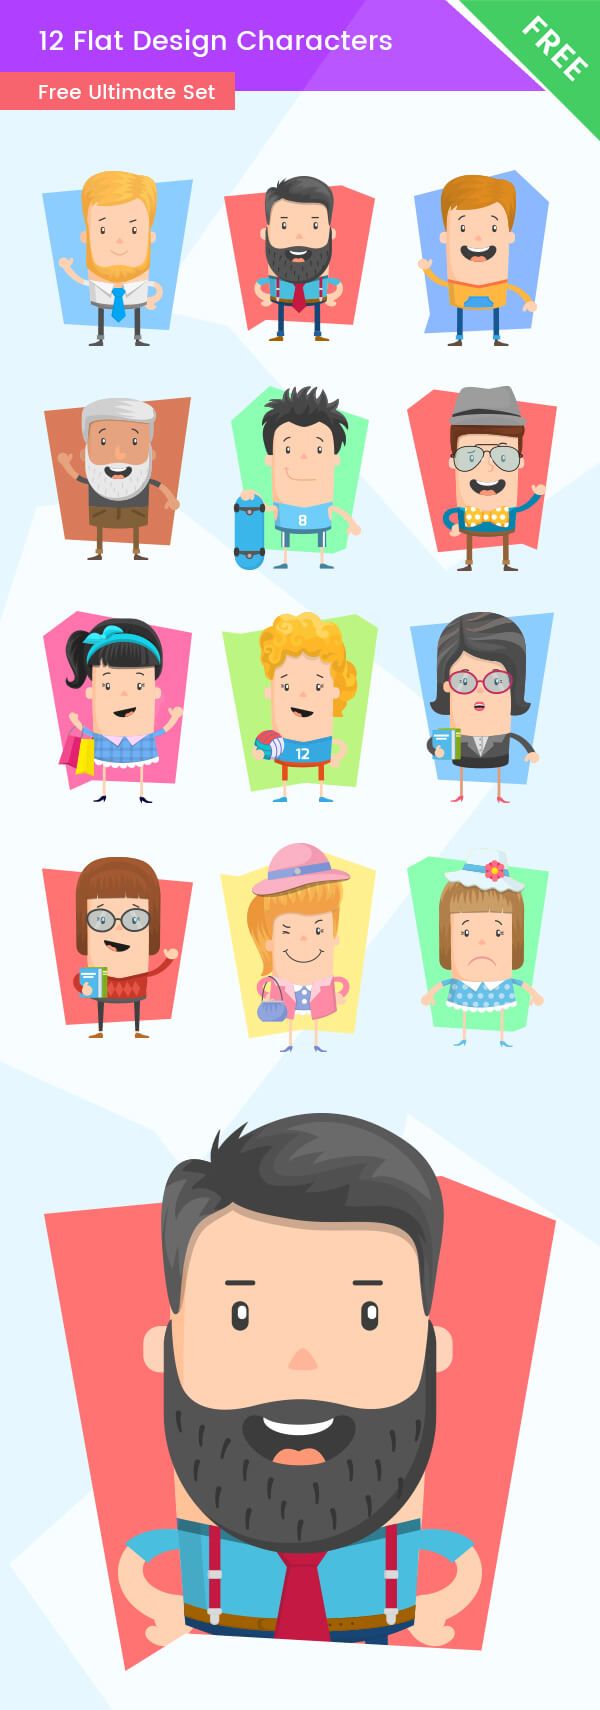 Flat Design Characters - Free Ultimate Set, flat characters, flat cartoons, free cartoon characters